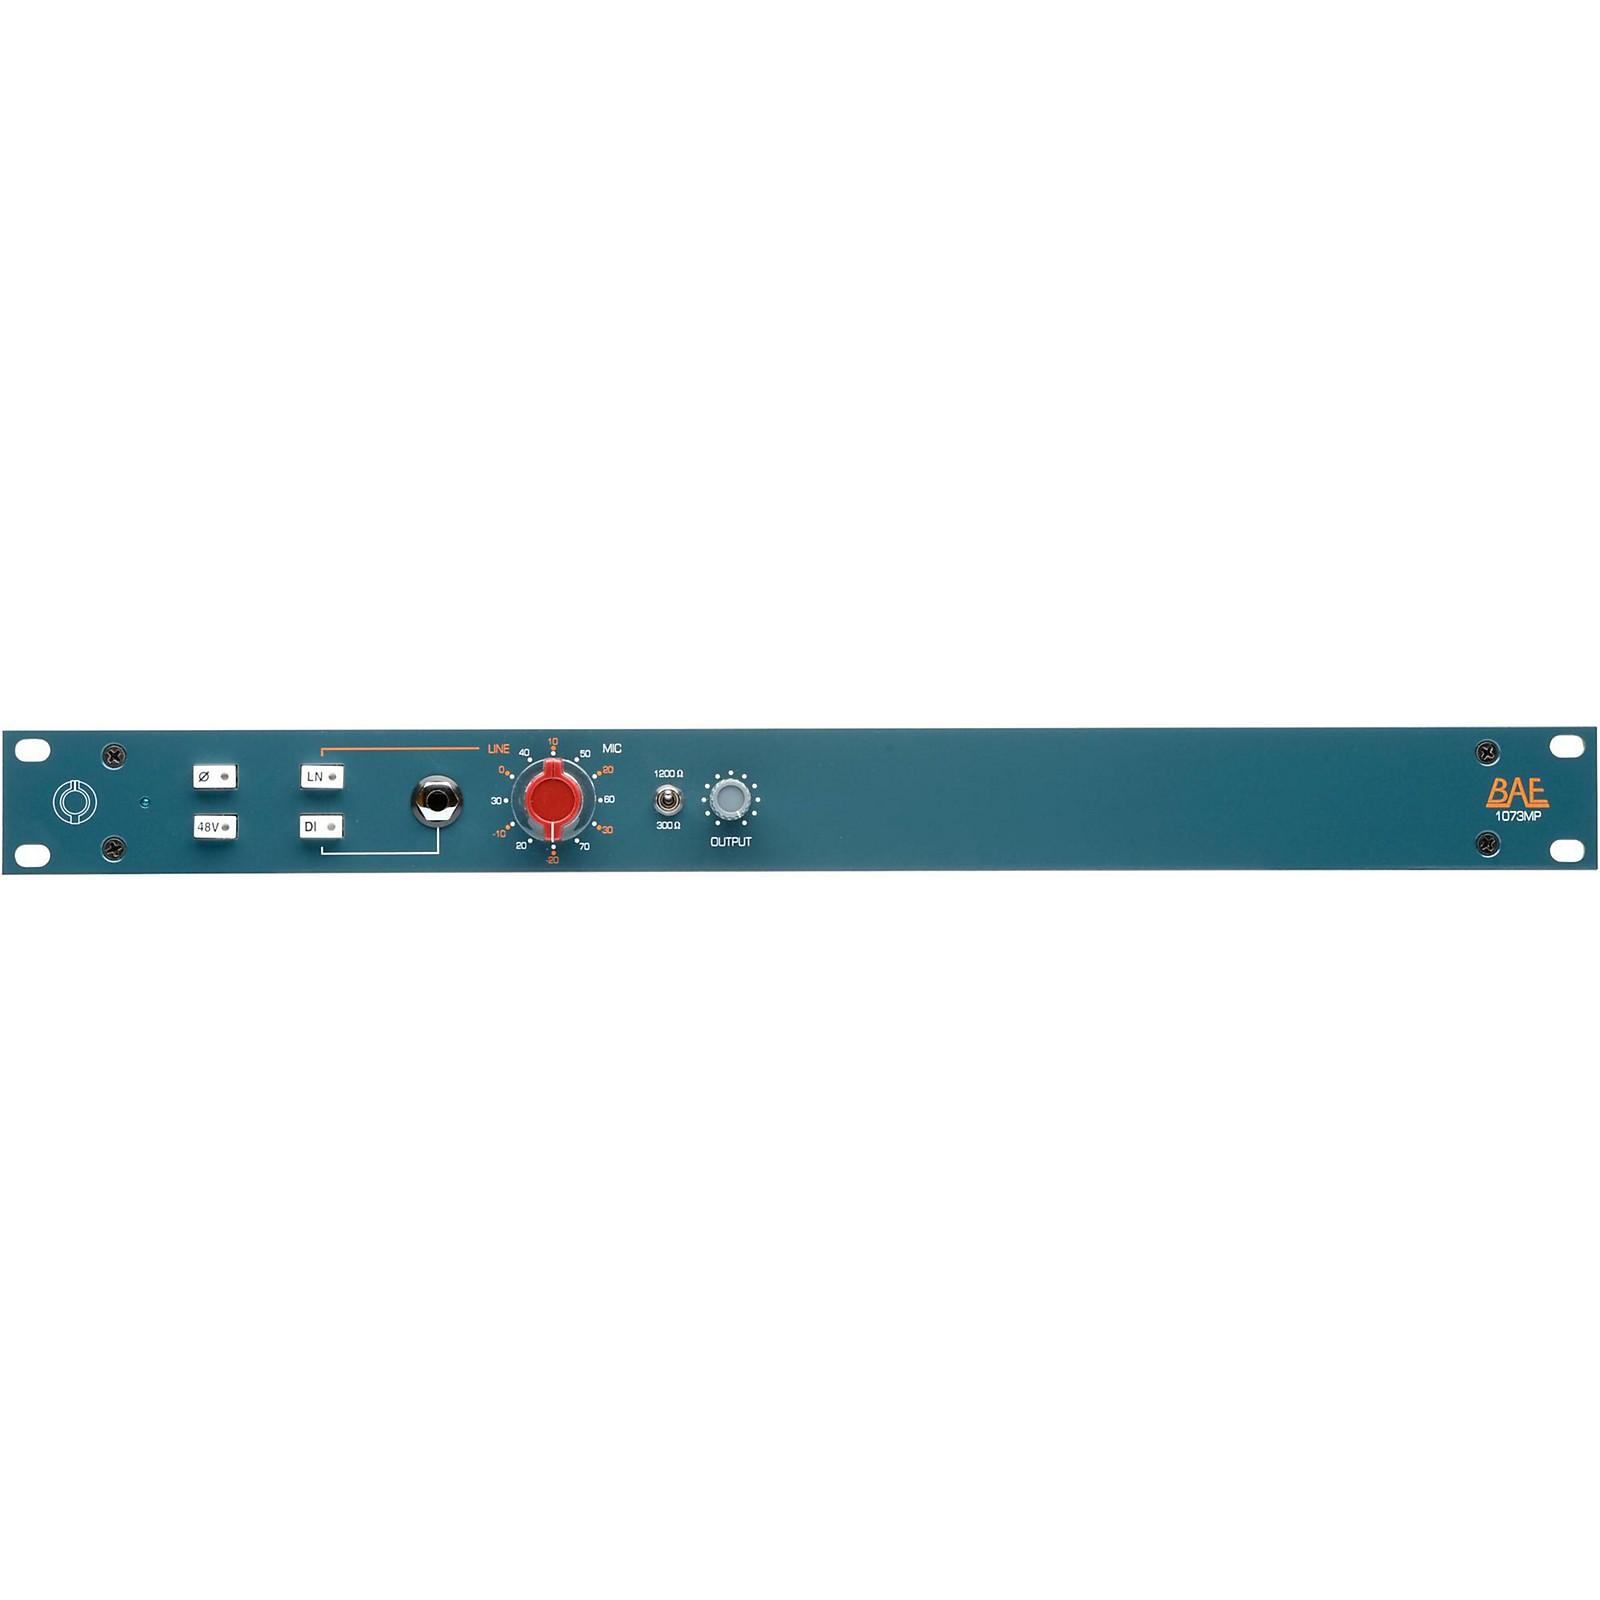 BAE 1073MP Single Channel